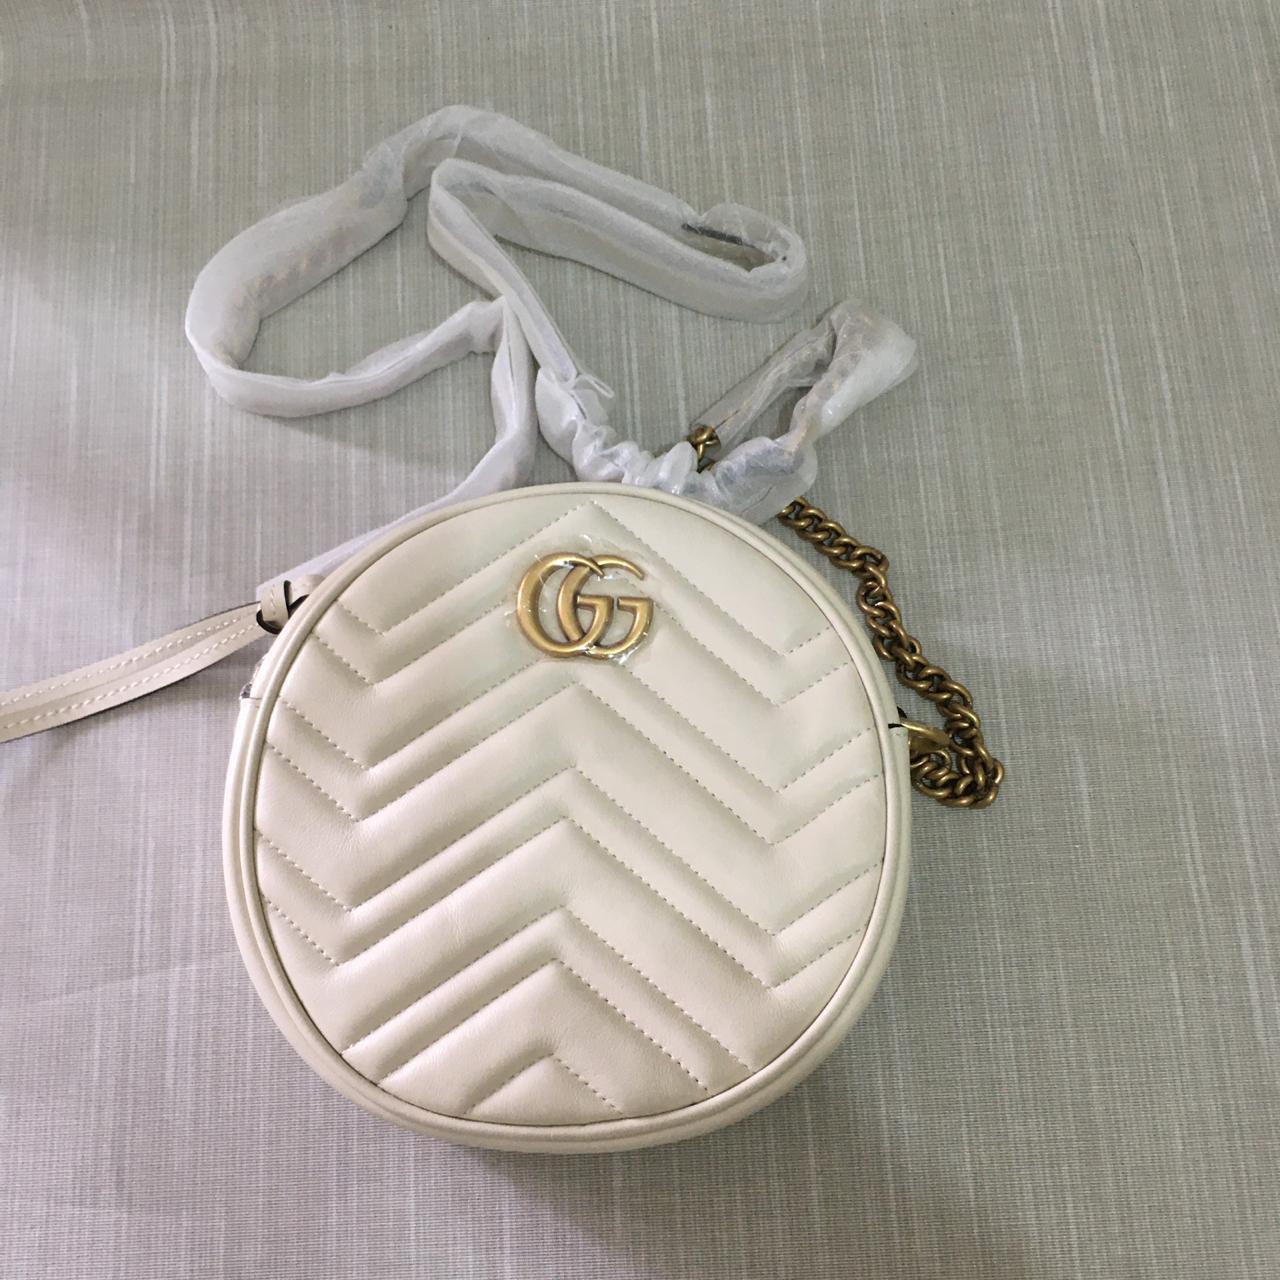 Bolsa Gucci GG Marmont Round